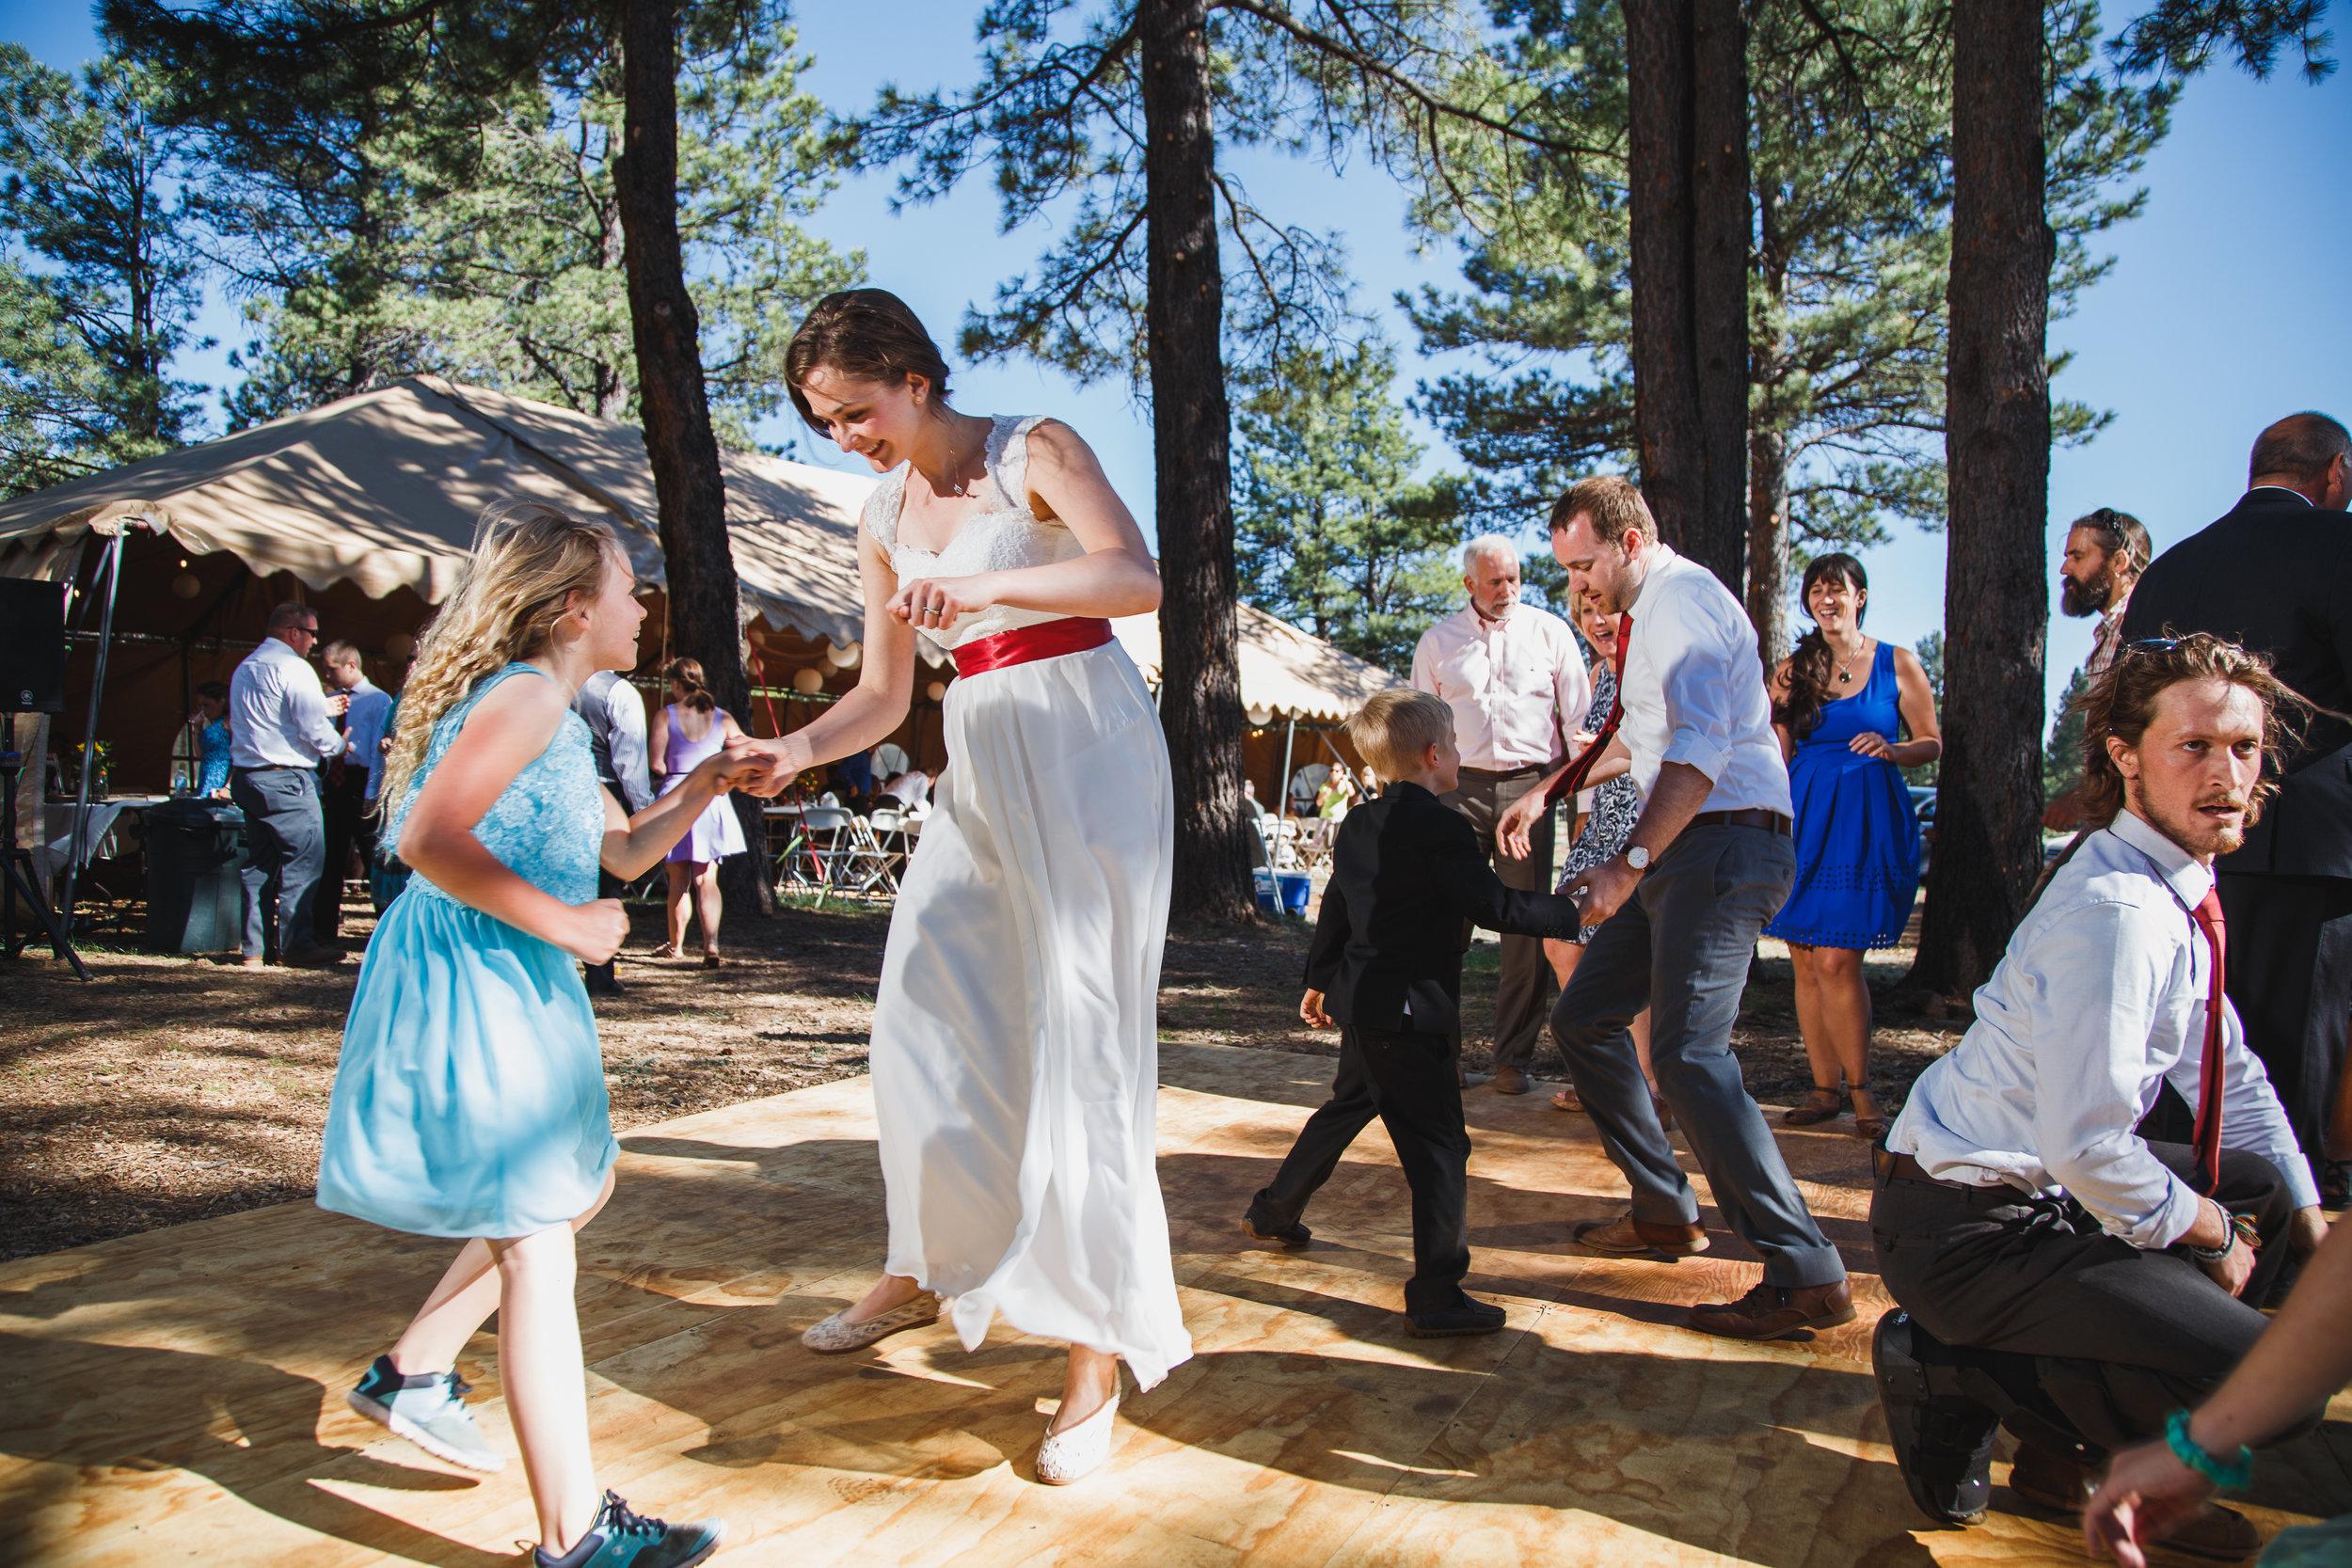 flagstaff-nordic-center-wedding-17.jpg